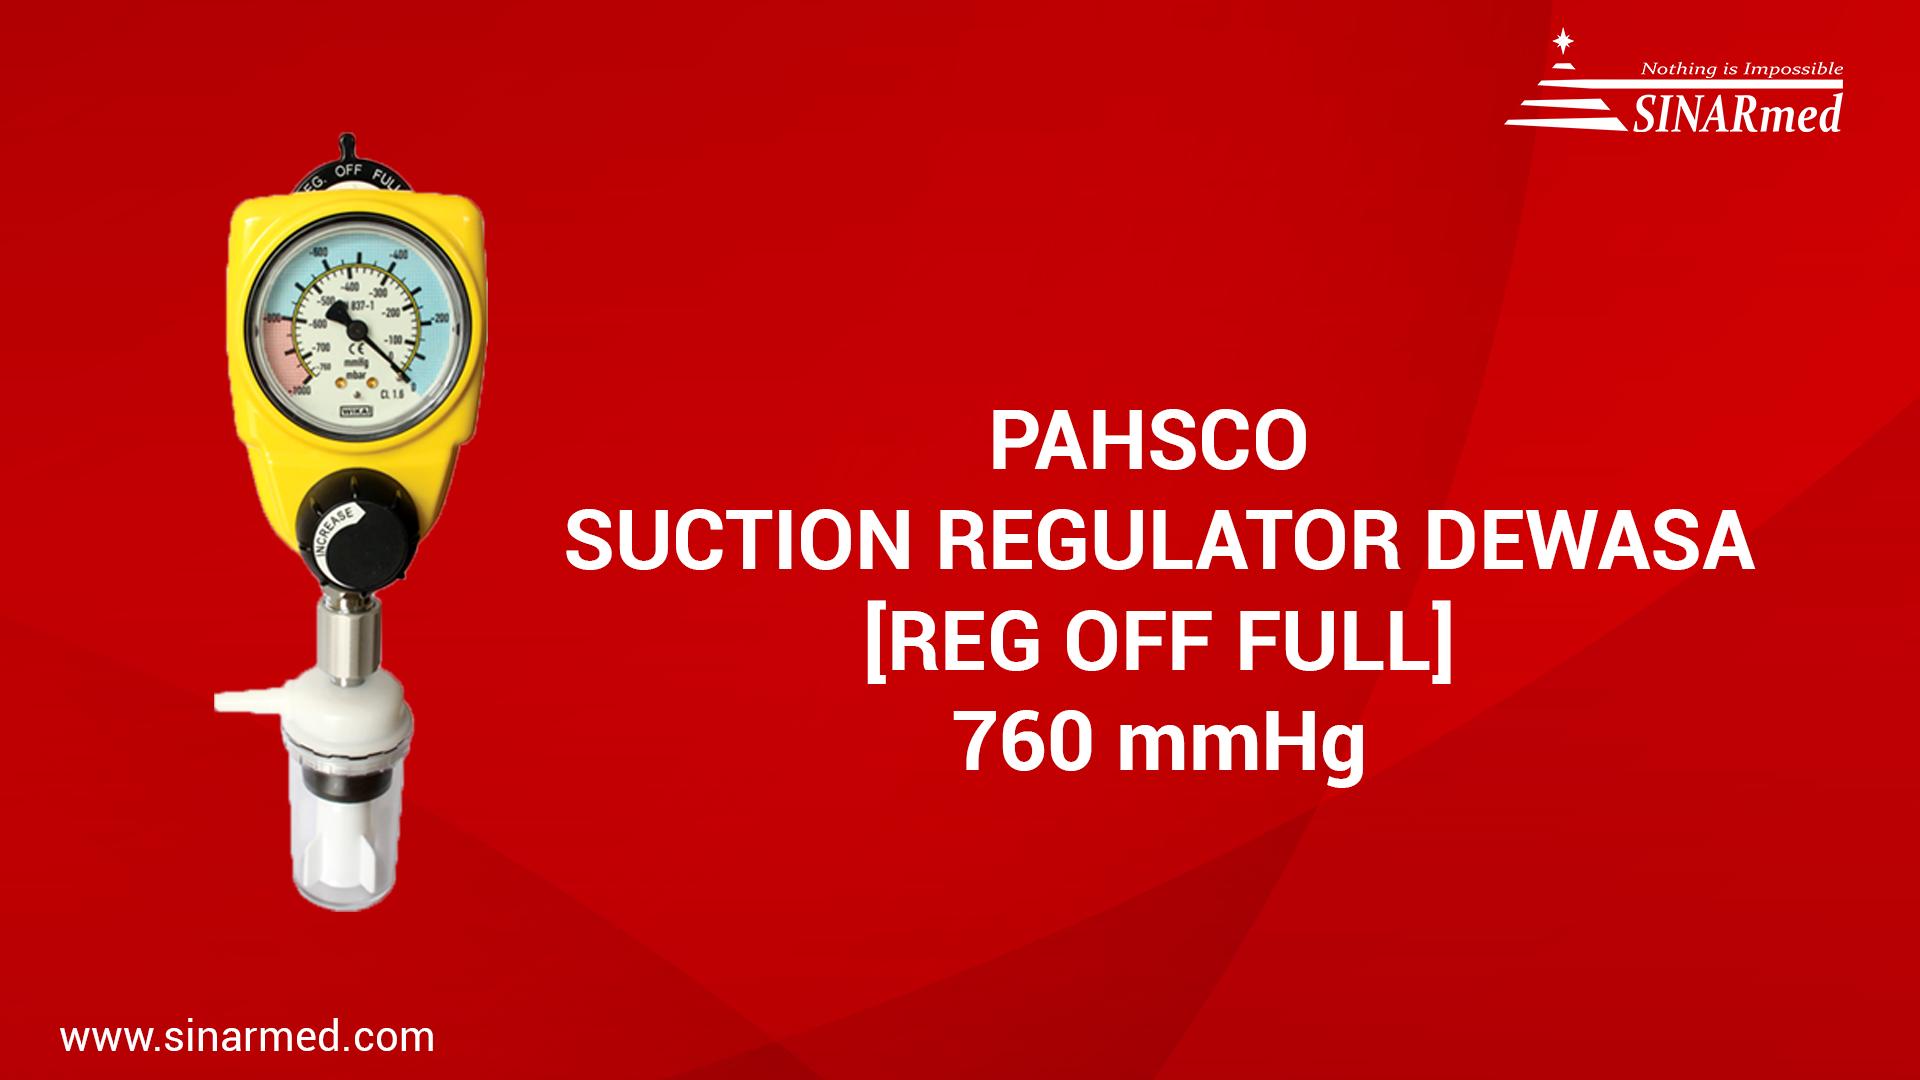 PAHSCO SUCTION REGULATOR MEDICAL DEWASA [REG OFF FULL] 0-760mmHg